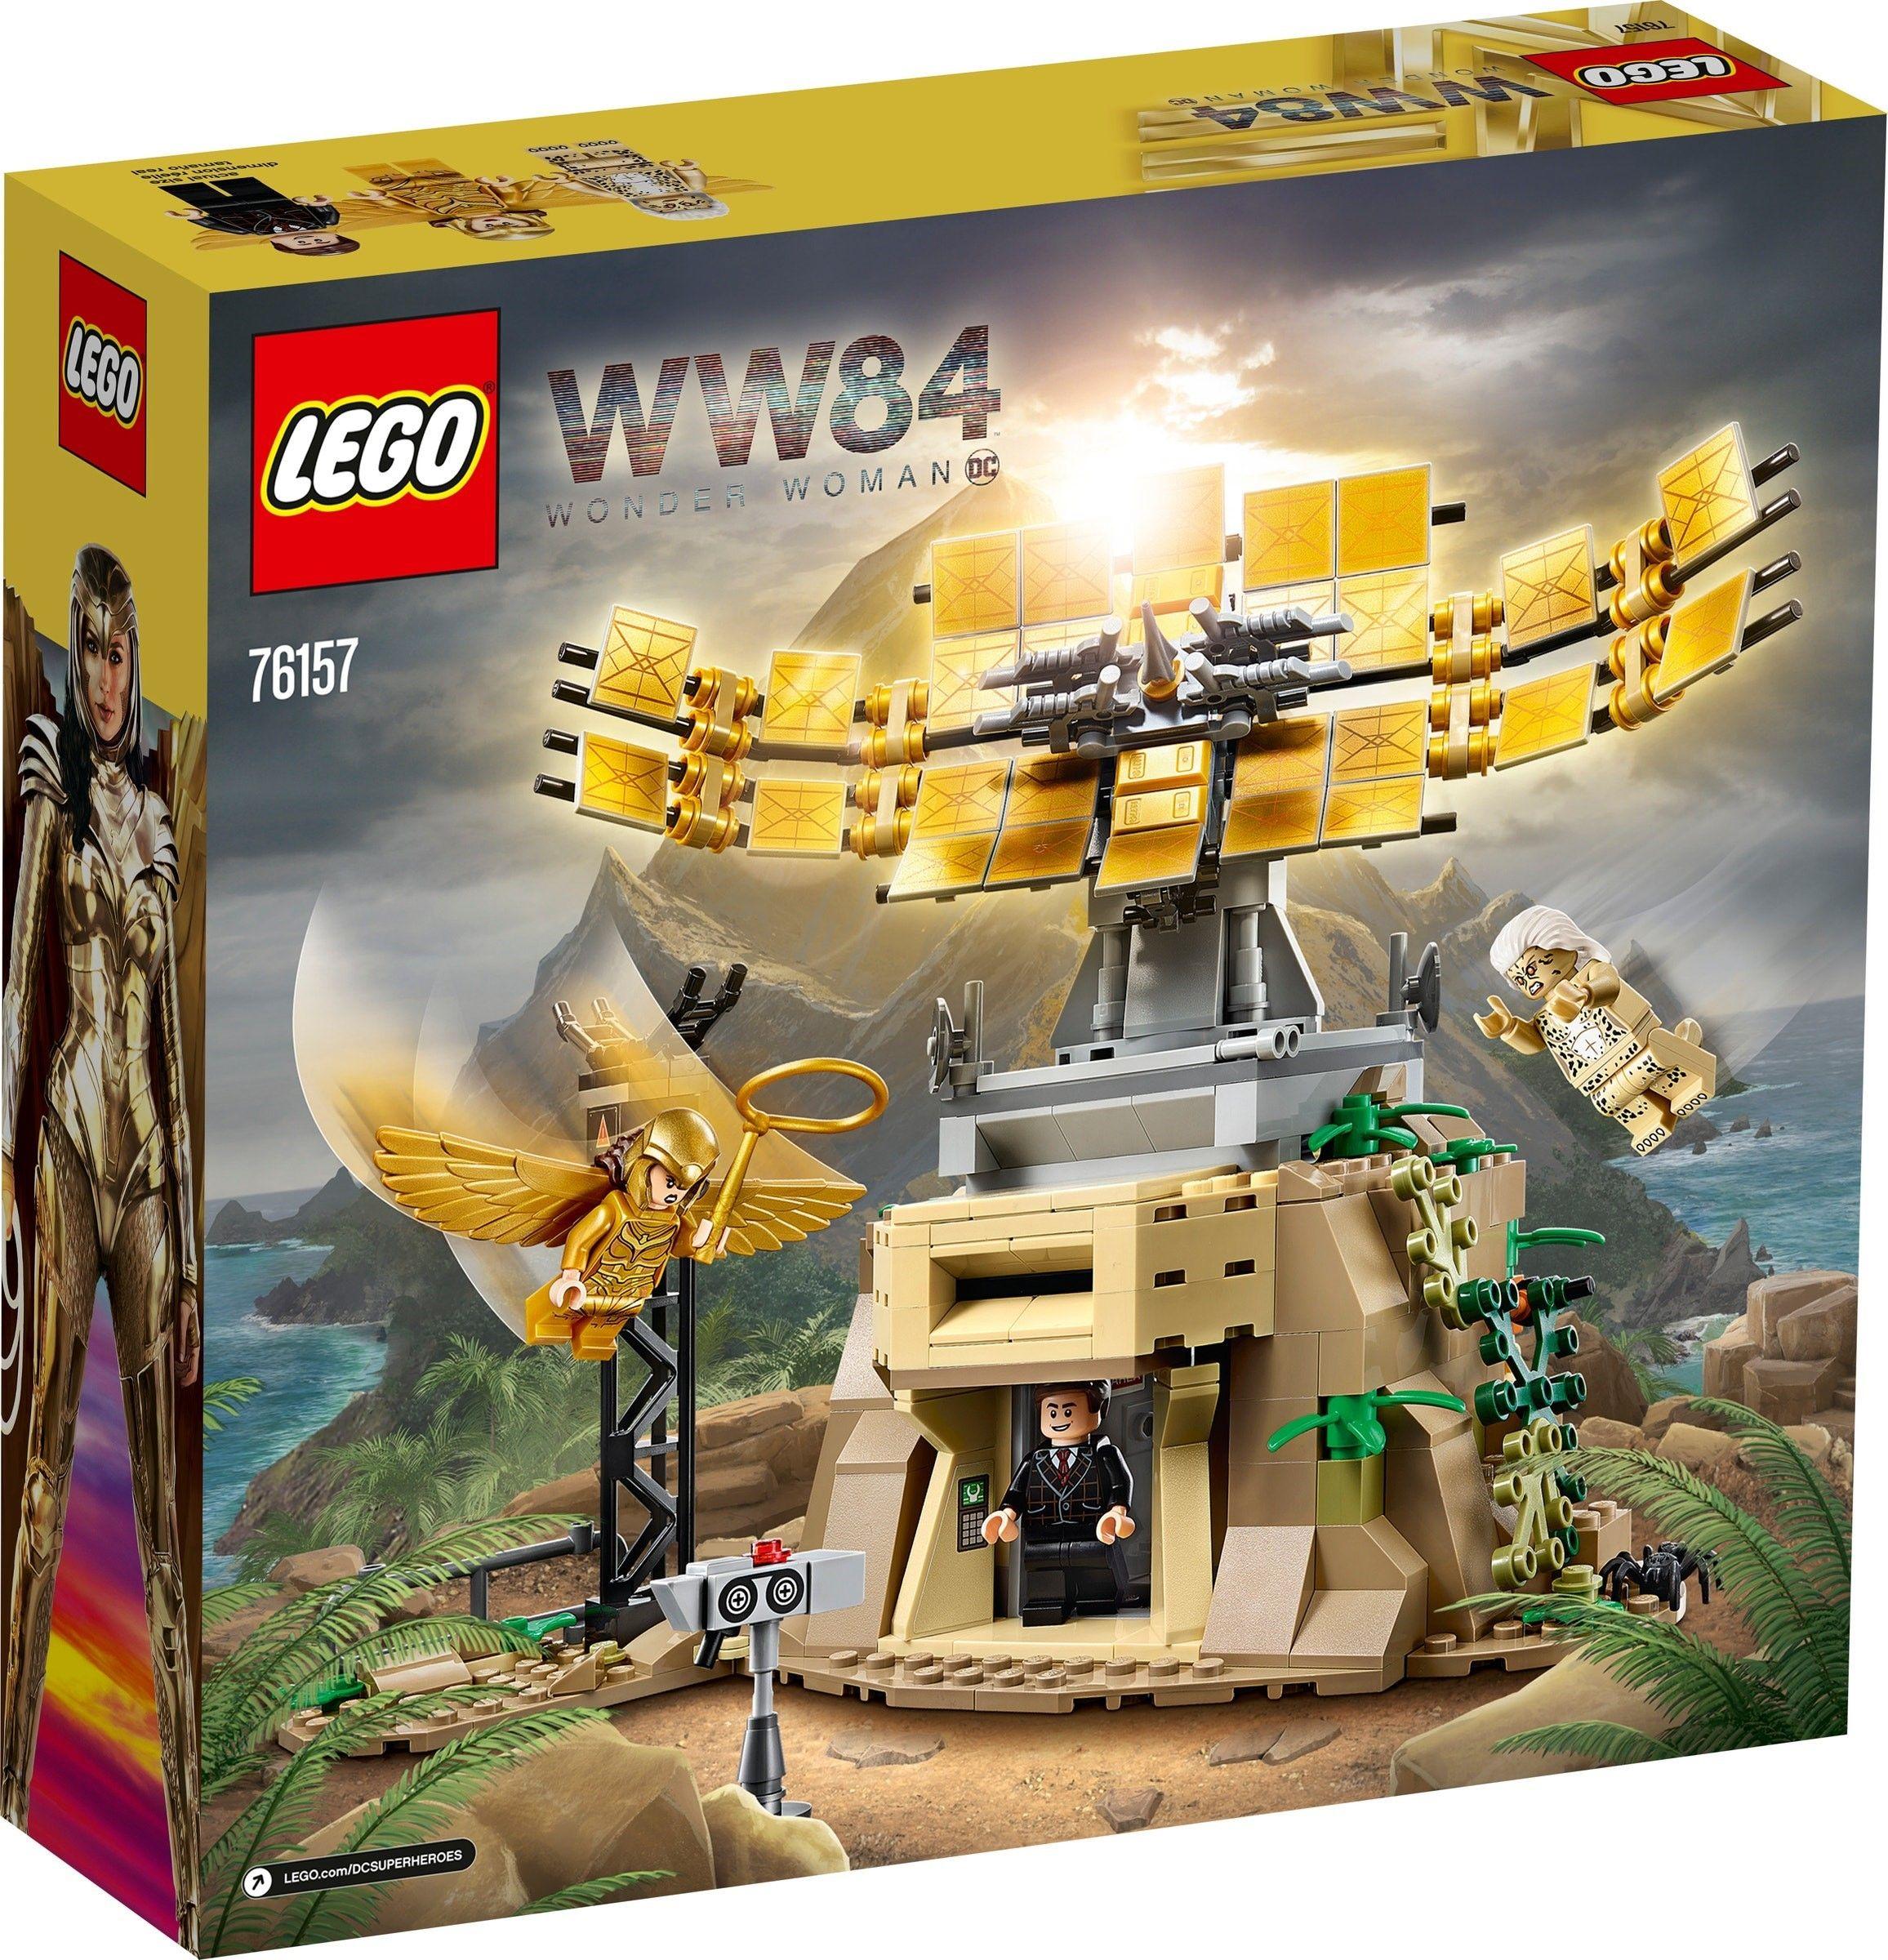 Lego 76157 1 Wonder Woman Vs Cheetah In 2020 Wonder Woman Vs Cheetah Lego Dc Lego